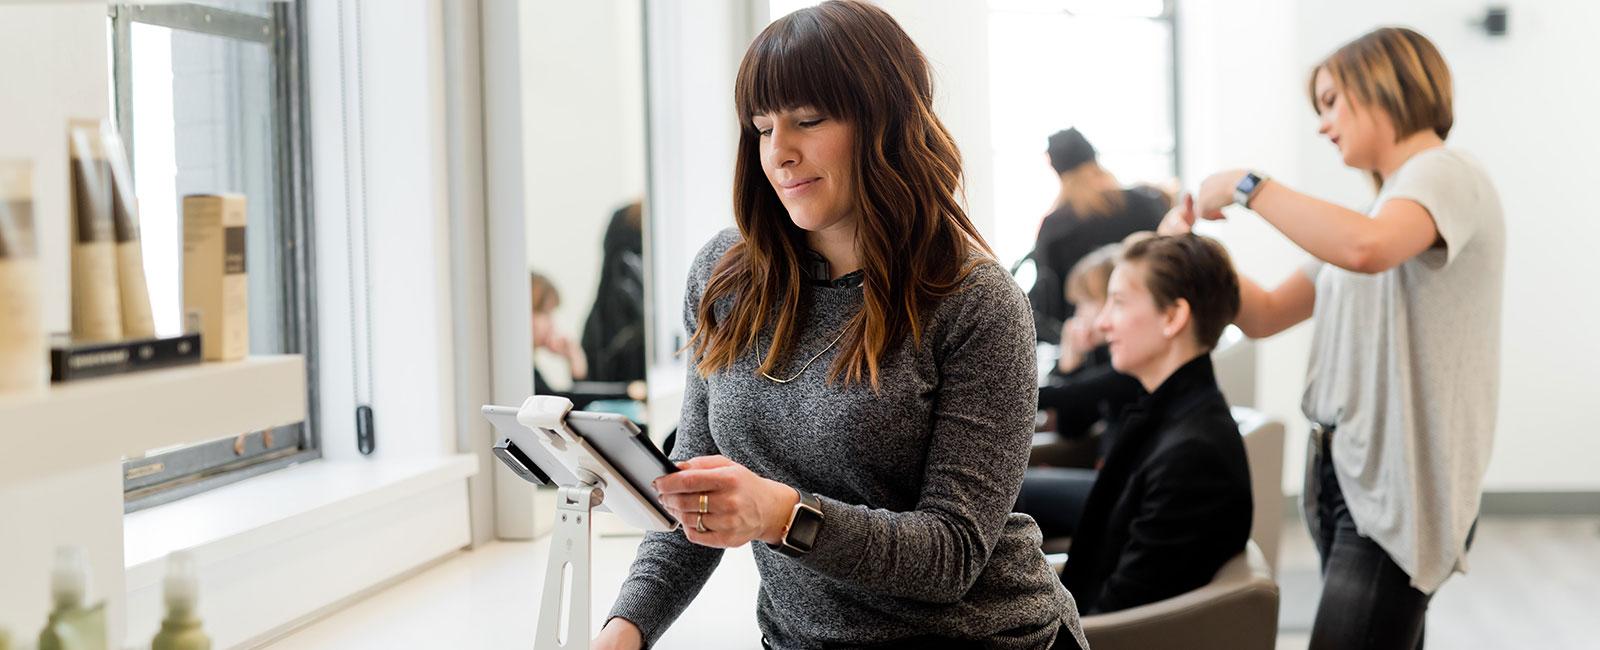 DIY Marketing - Can Customers Reach You